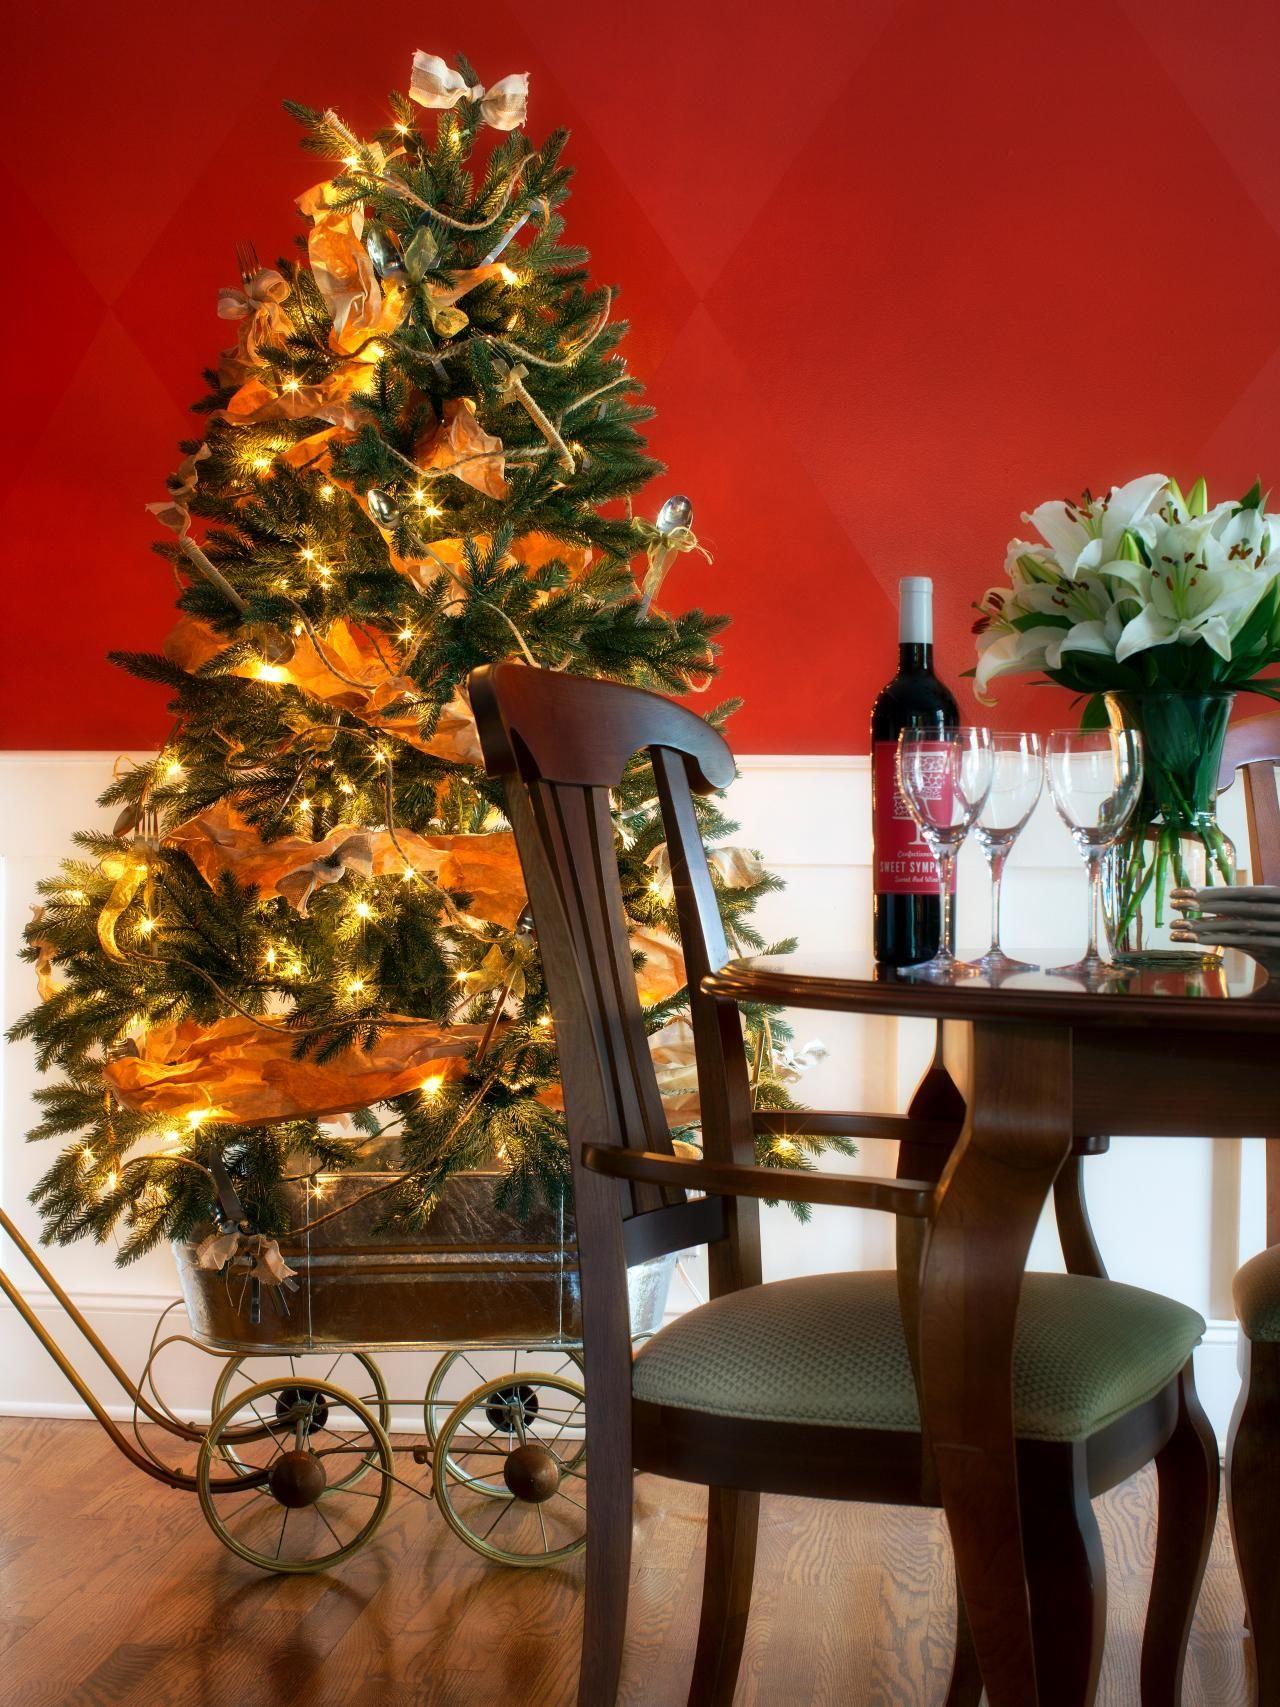 50+ Christmas Tree Decorating Ideas